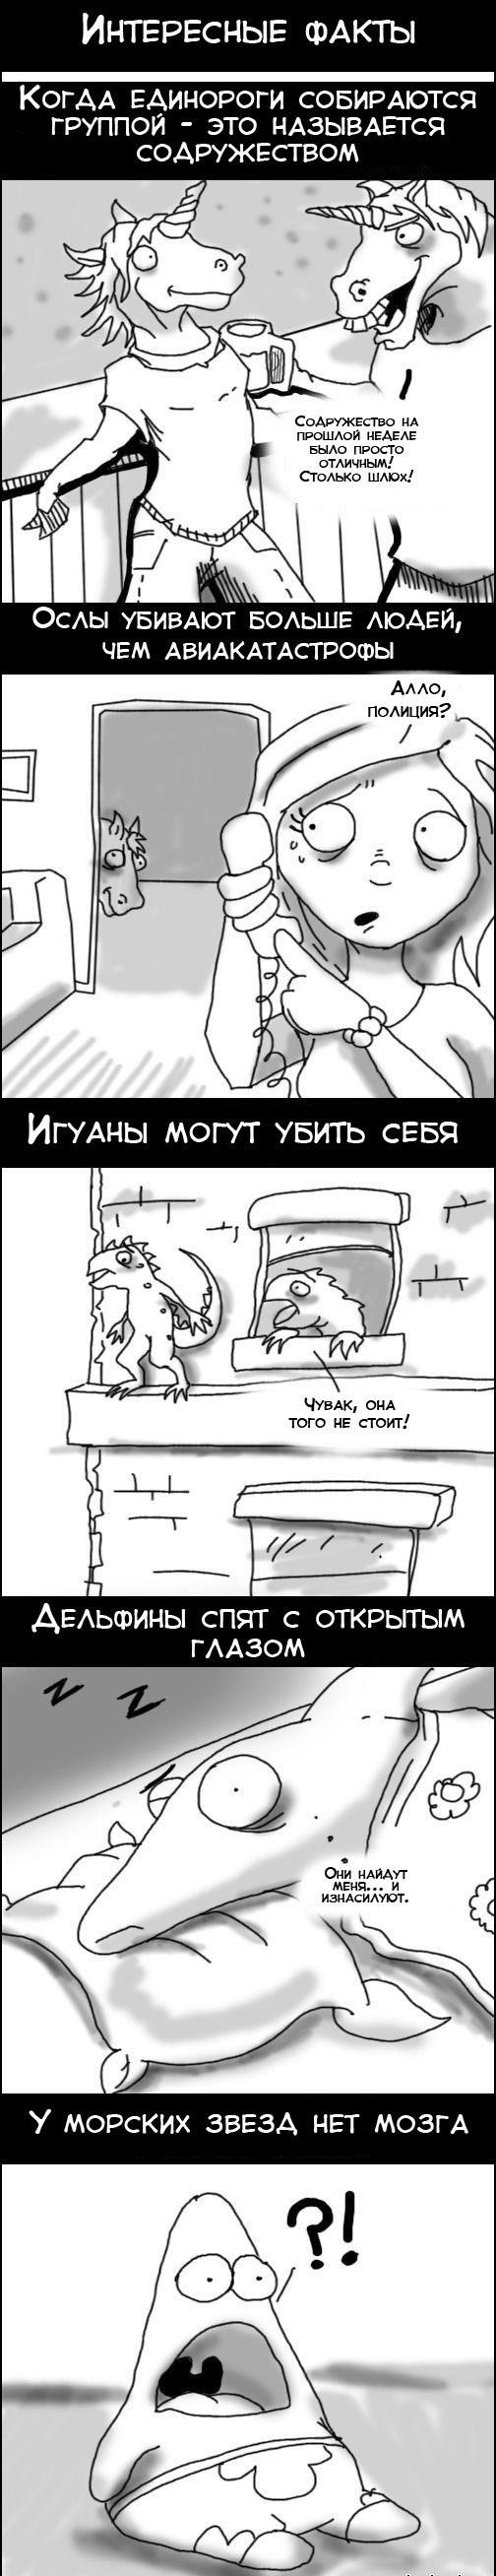 Смешные комиксы BroDude.ru smeshnie komiksi 0002643848